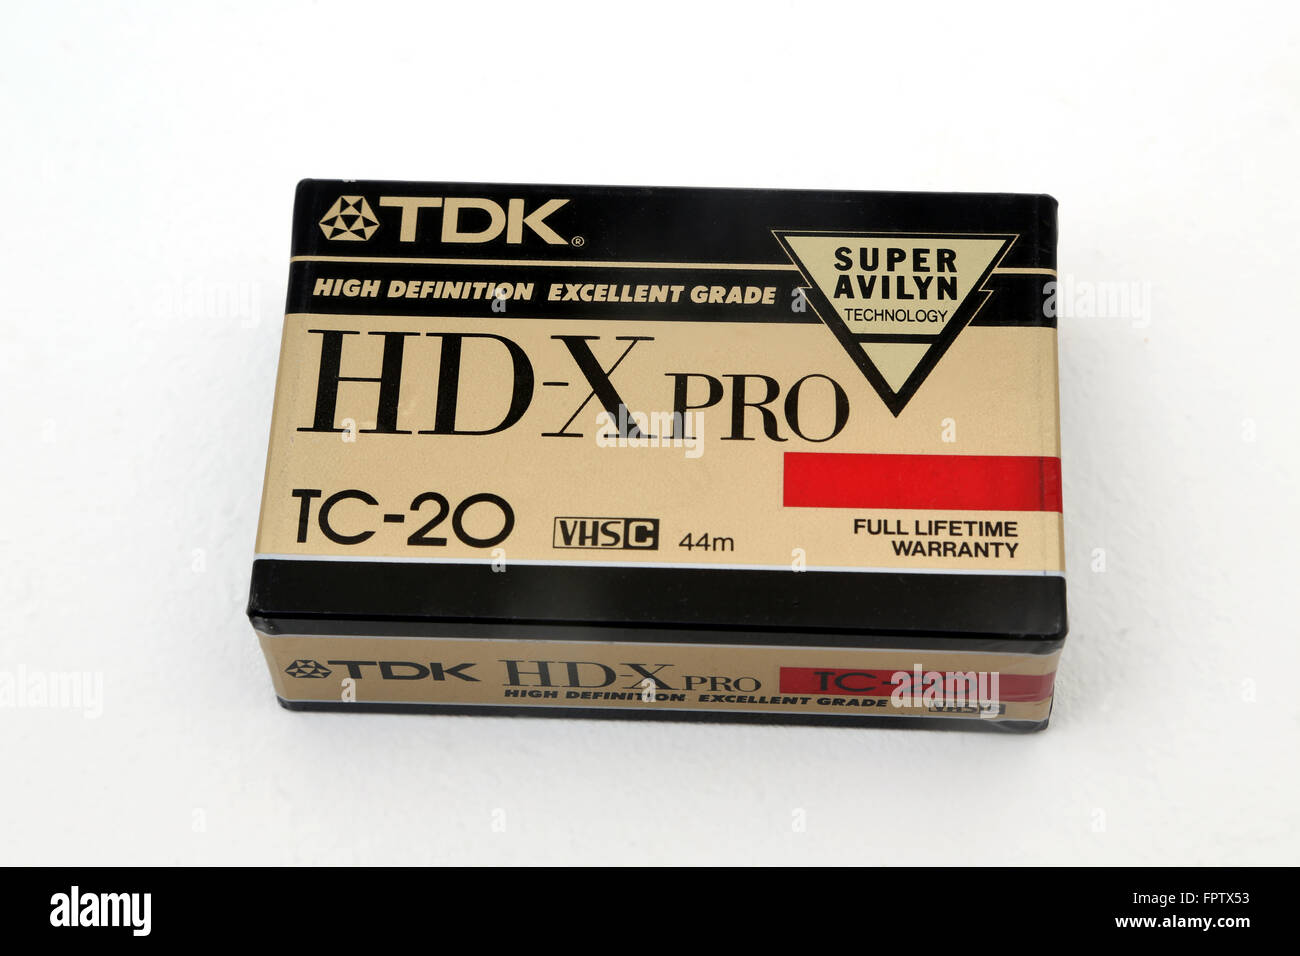 TDK VHS Cassette For Video Cameras - Stock Image